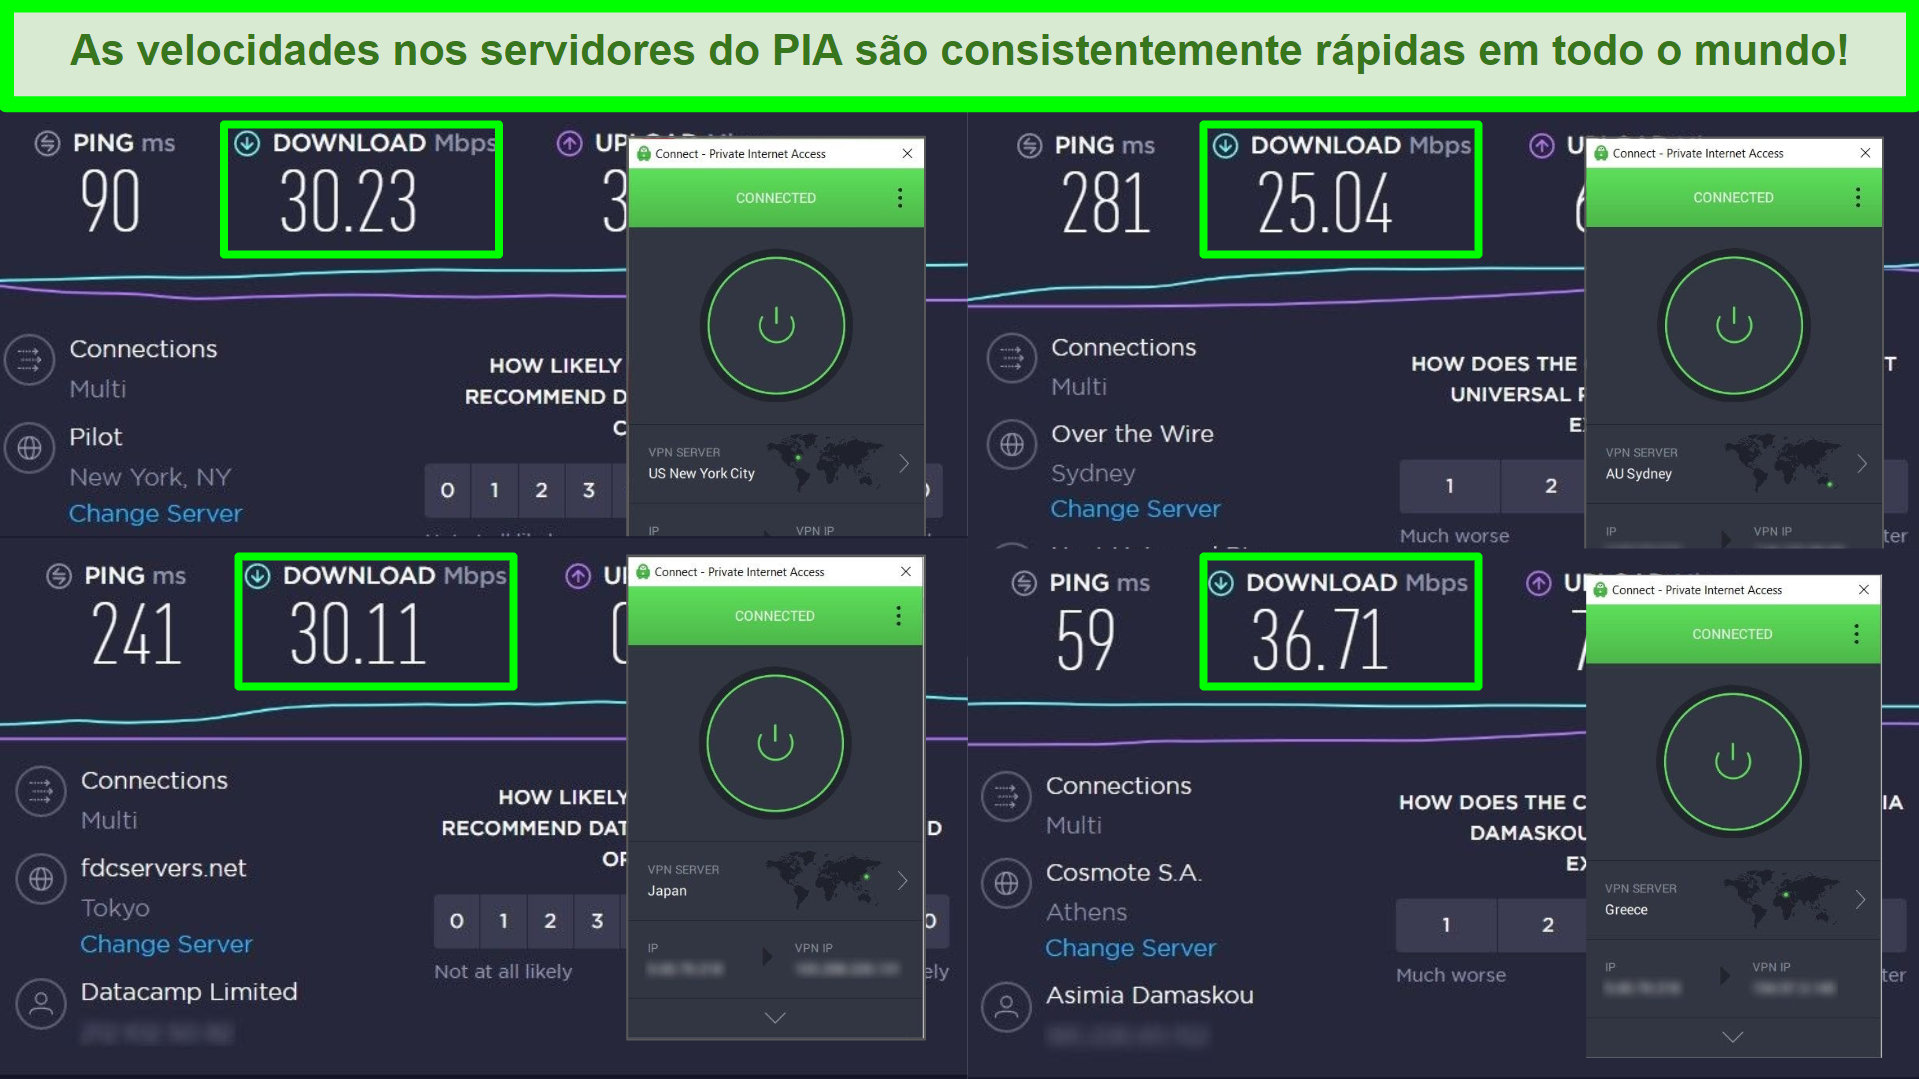 Capturas de tela de testes de velocidade Ookla com PIA conectado a diferentes servidores globais.